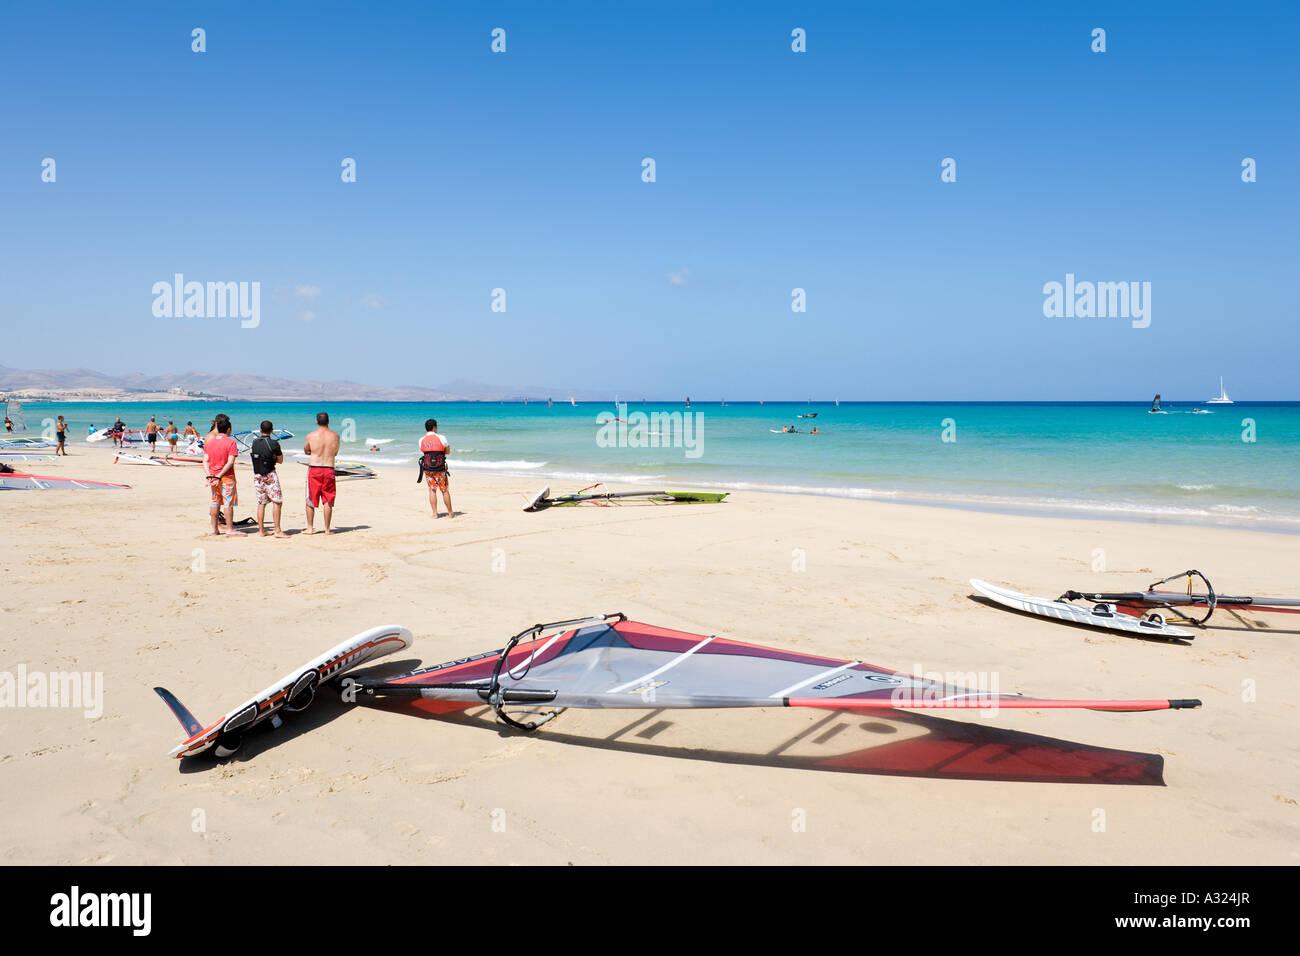 Windsurfing on Playa Barca beach, Costa Calma, Fuerteventura, Canary Islands, Spain - Stock Image